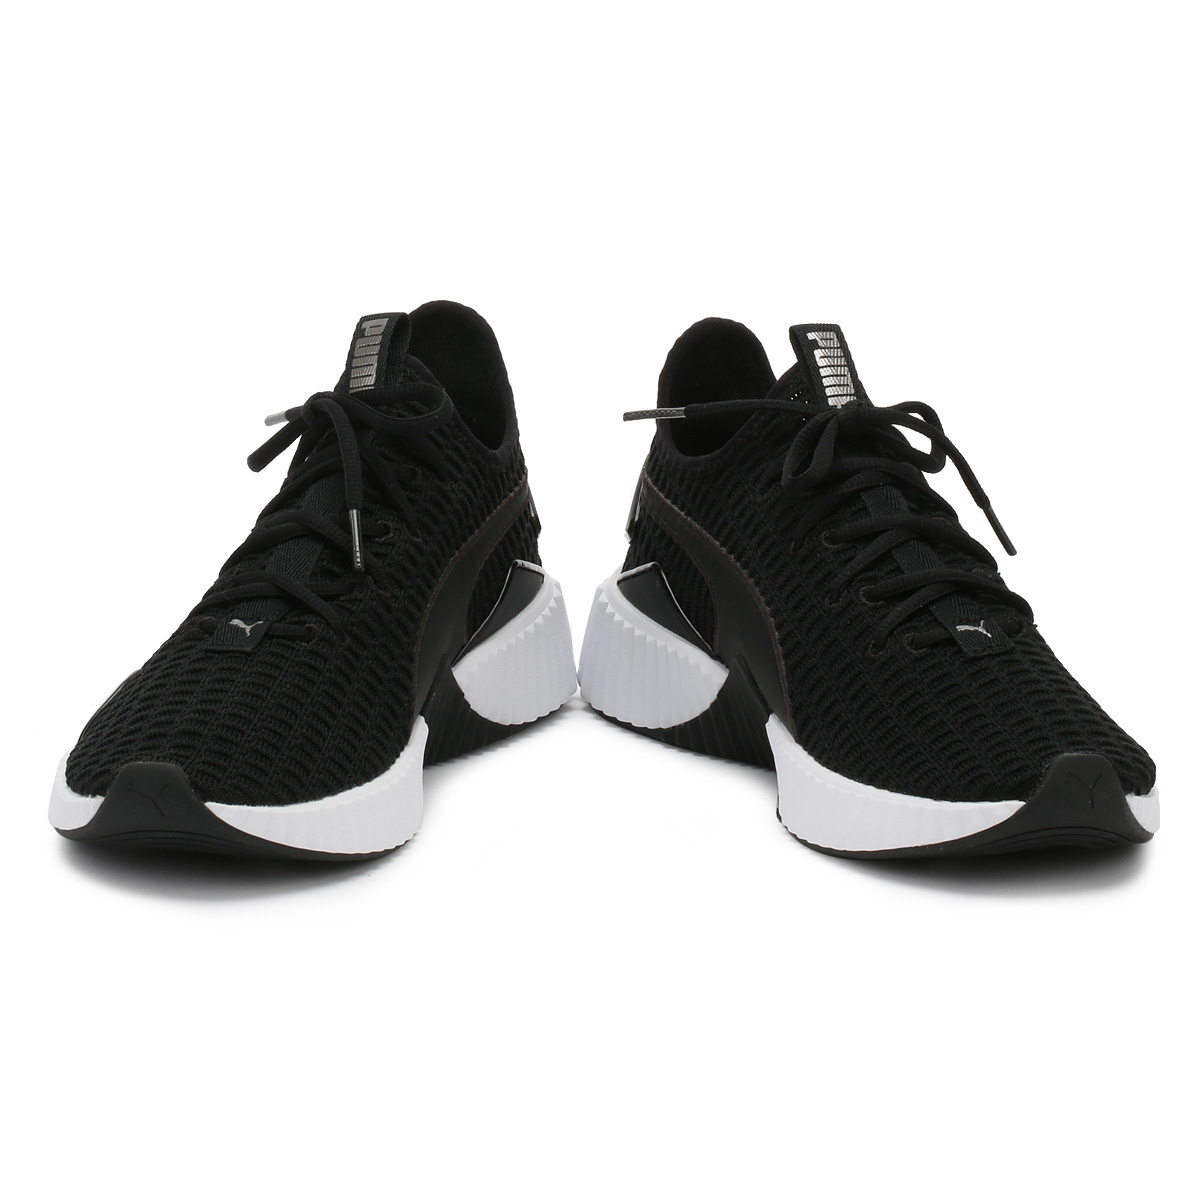 58f58ef07846 PUMA Womens Selena Gomez Black   Black Defy Trainers